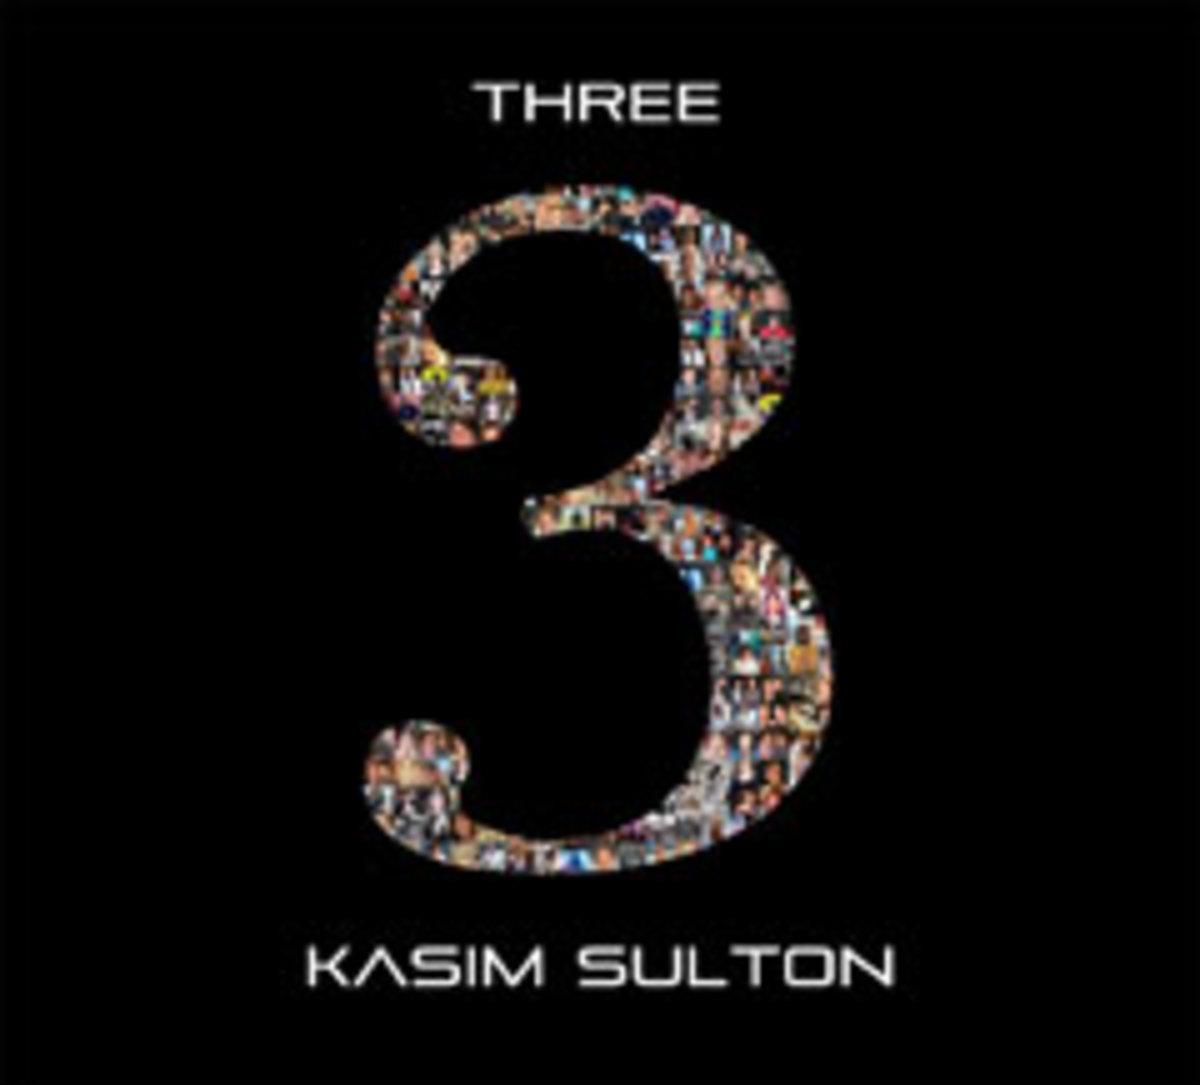 KASIM-3-cover-art